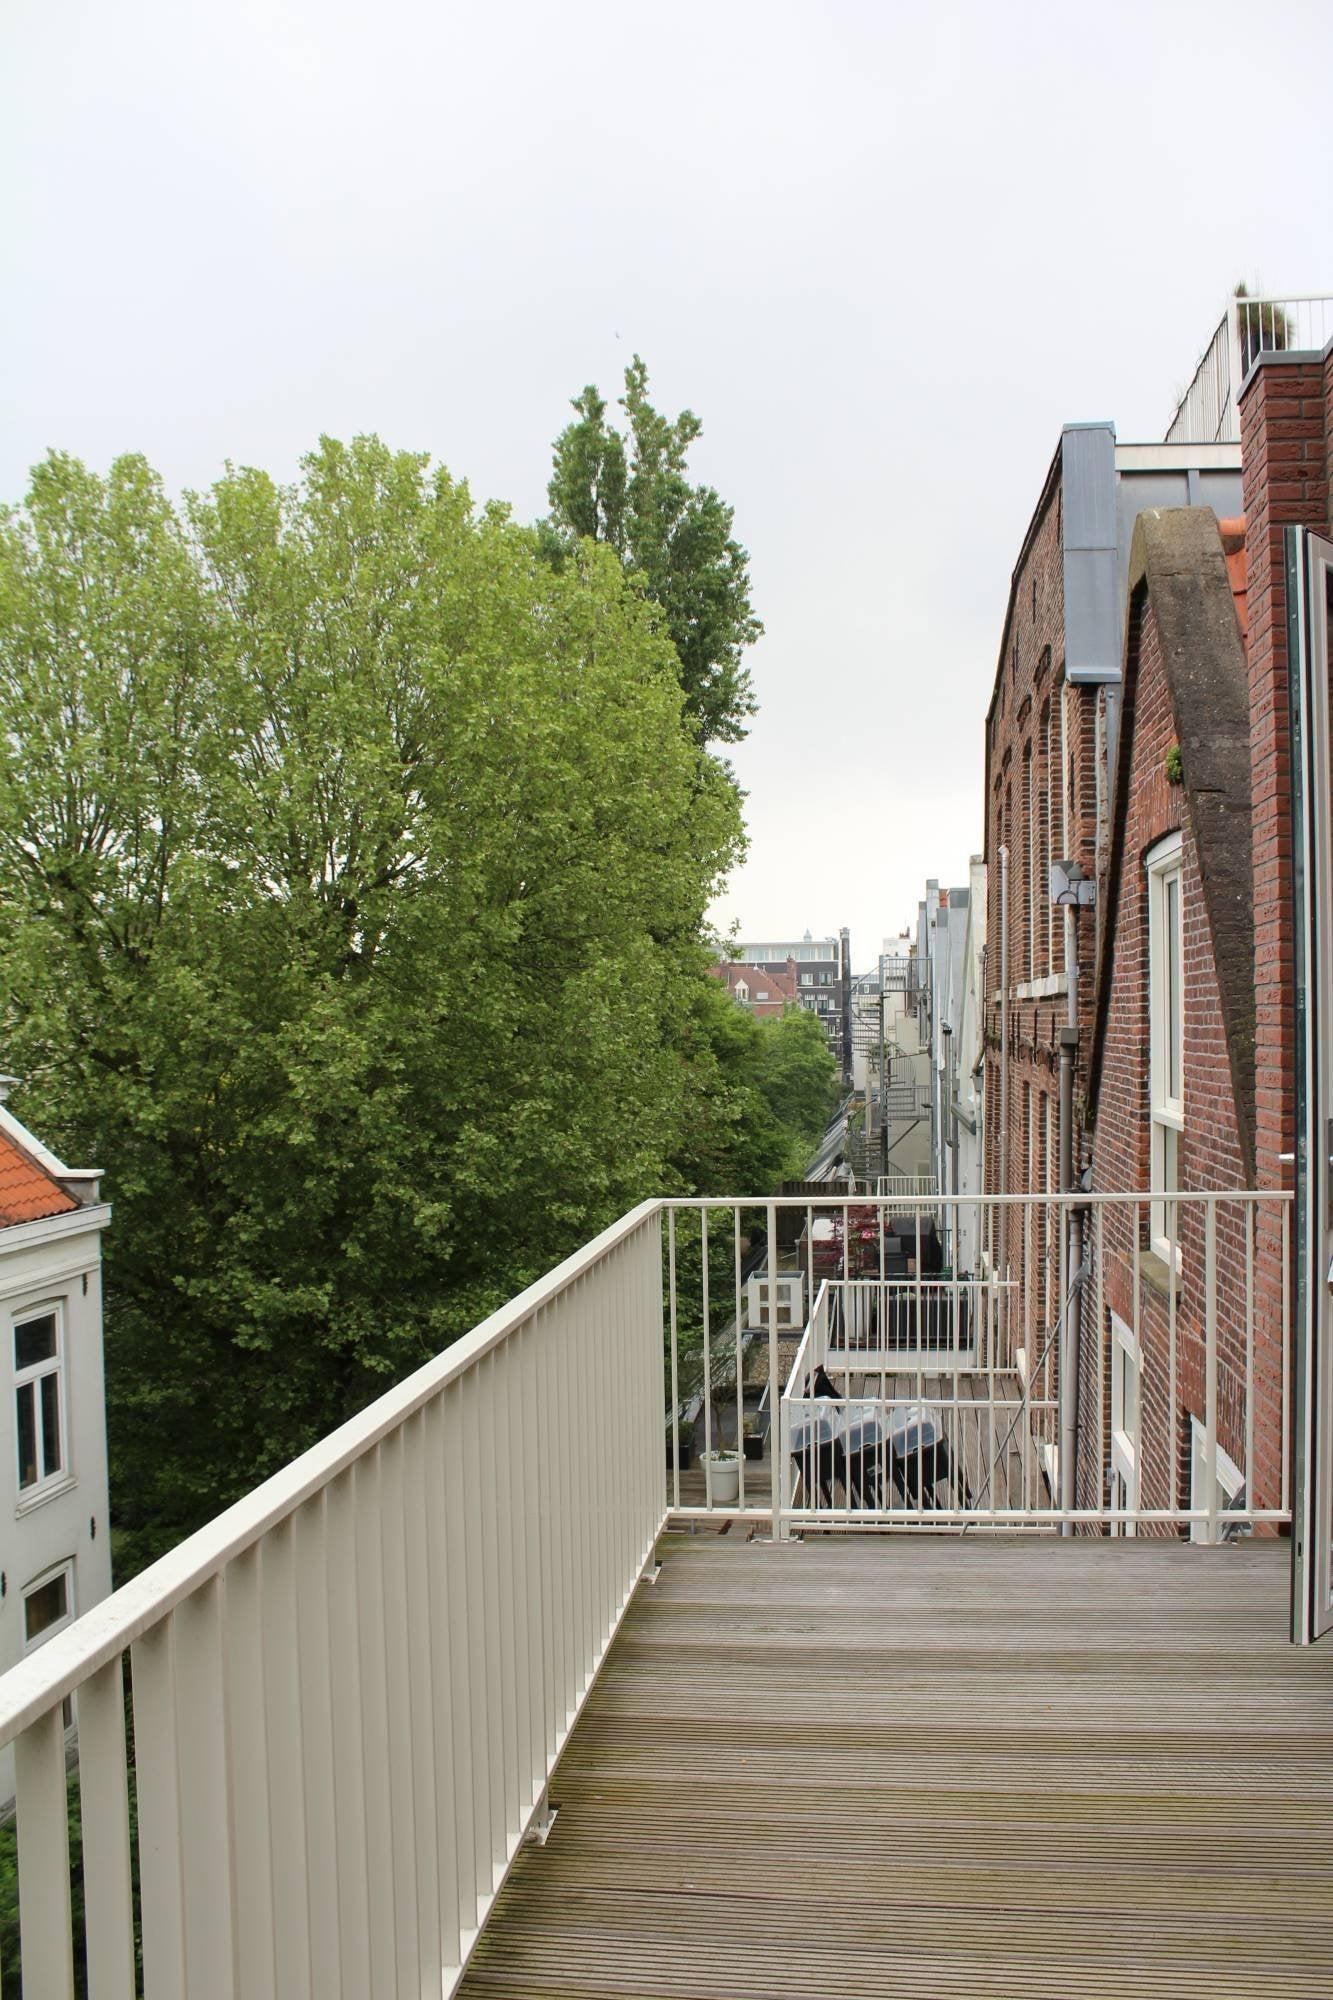 https://public.parariusoffice.nl/15/photos/huge/2850156.1463668708-387.JPG